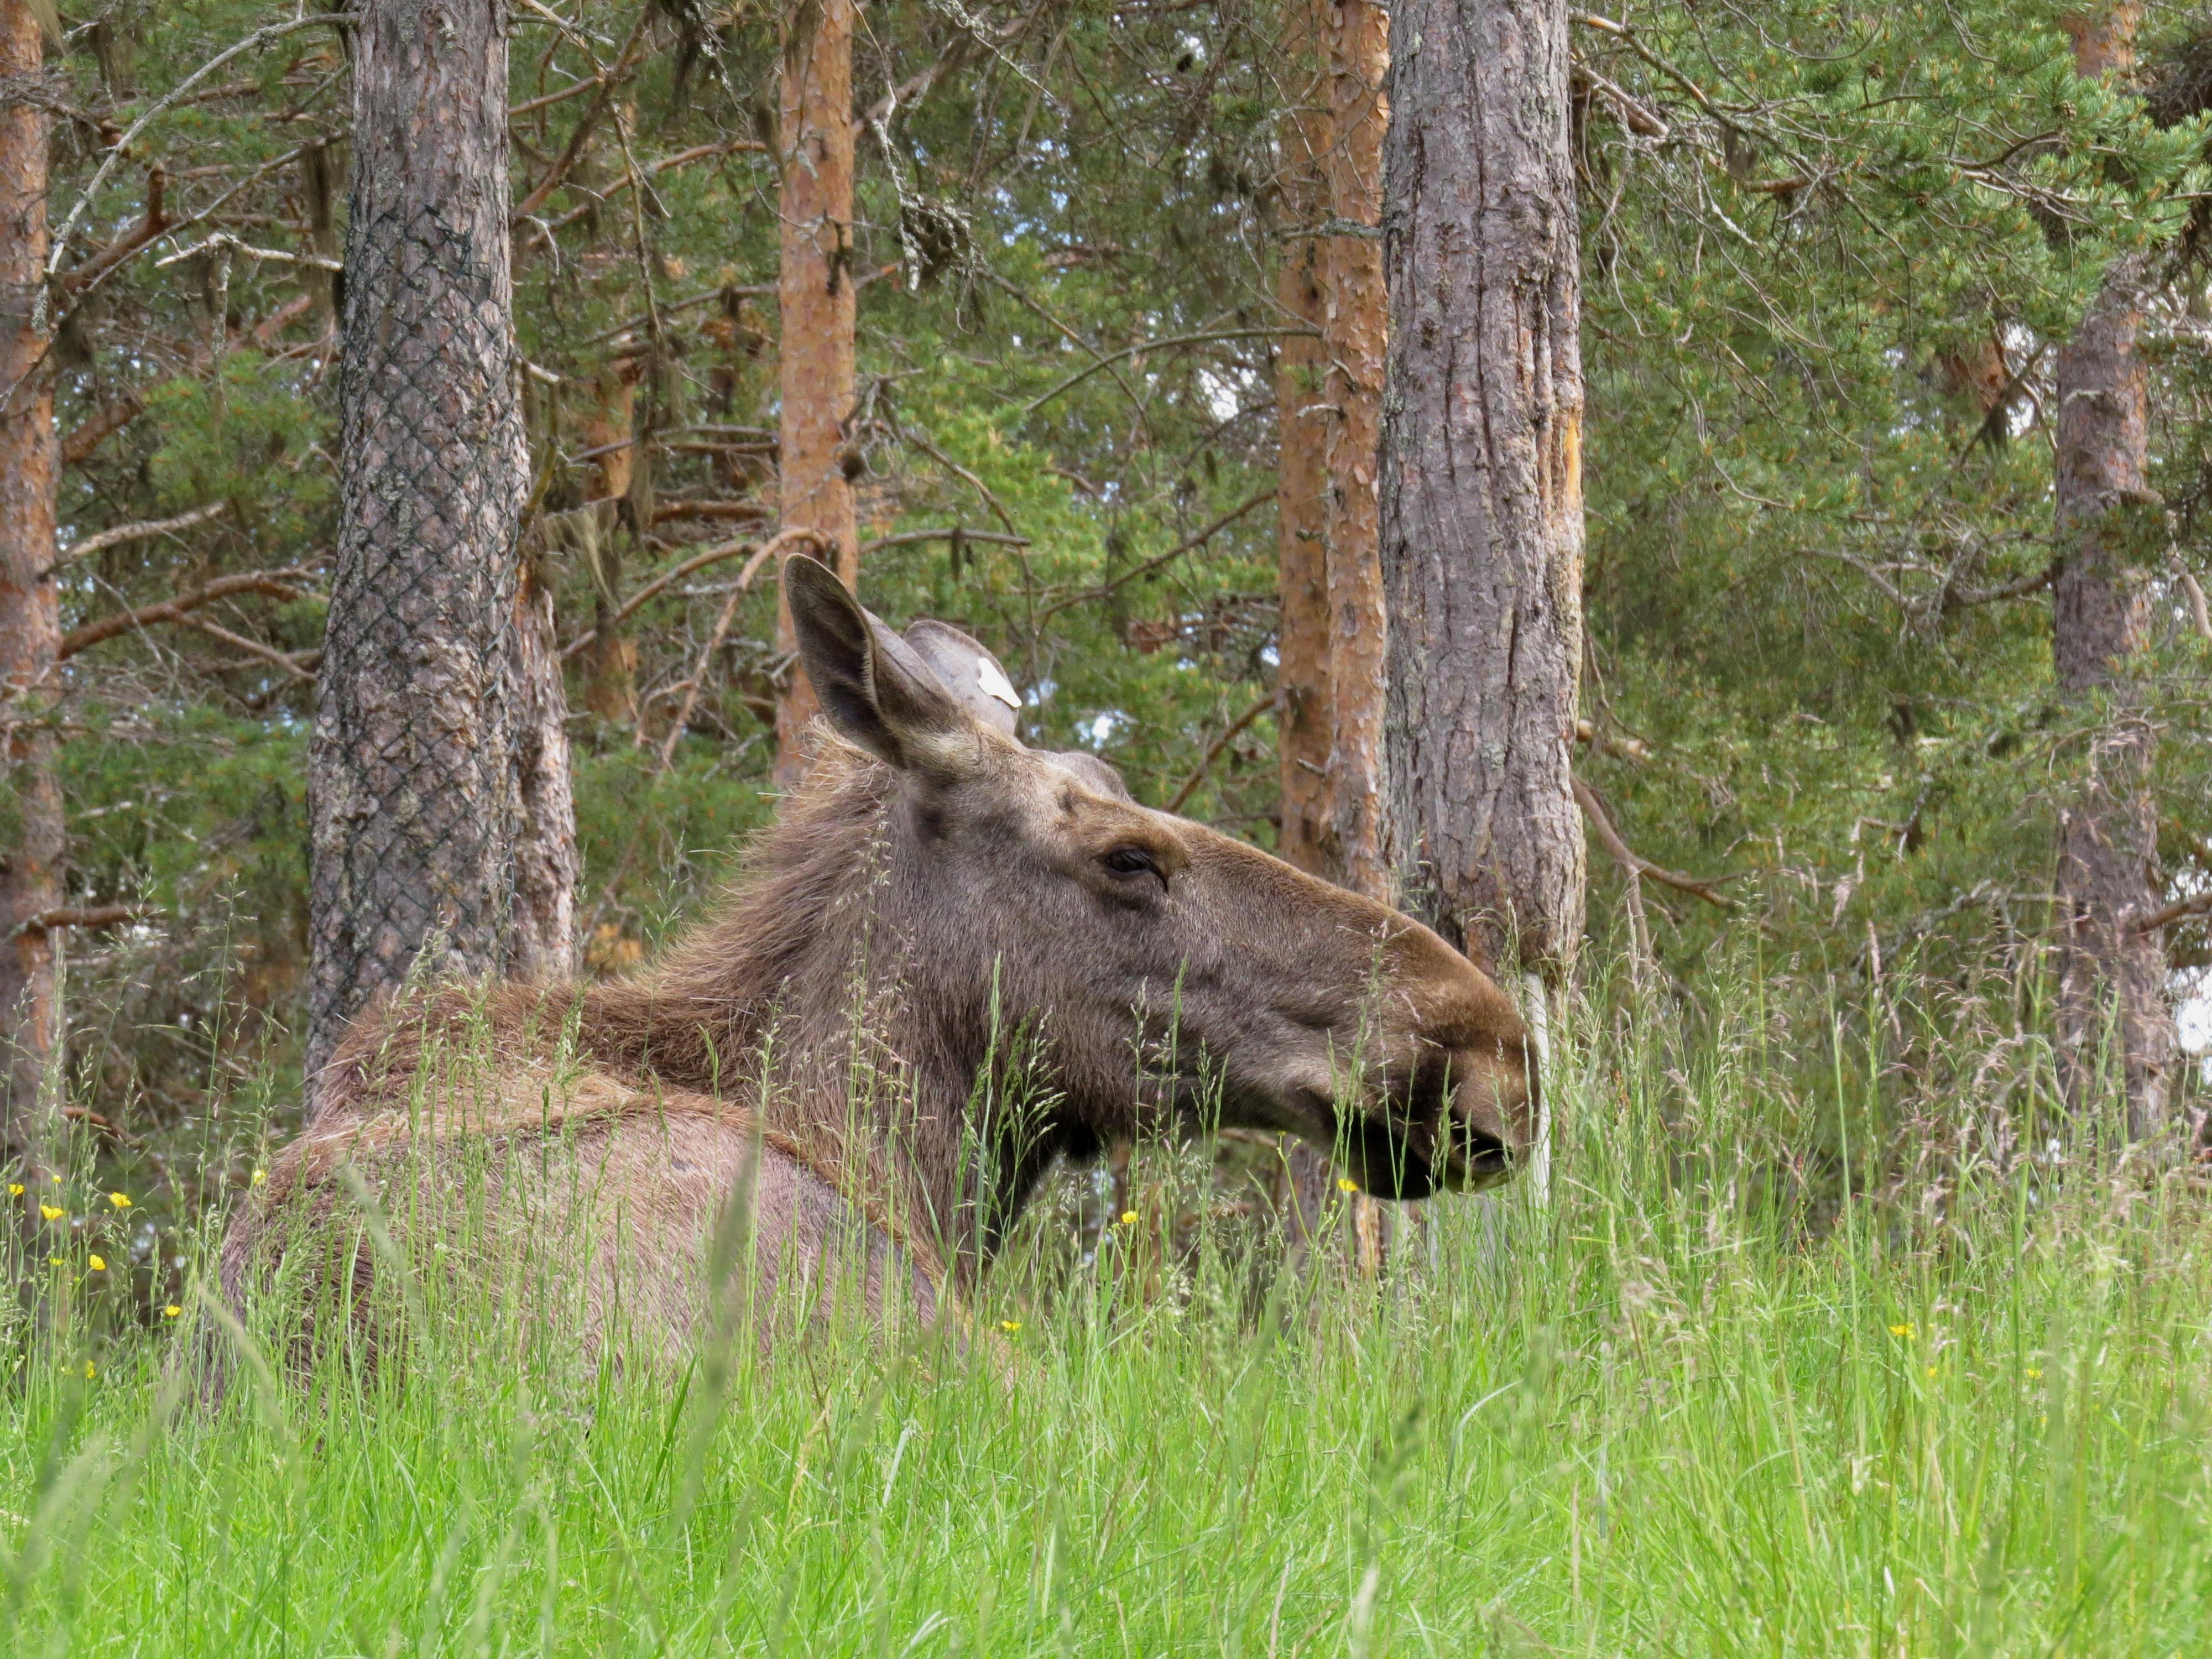 älgar I Lycksele Djurpark Däggdjur Mina Foton Ifokus